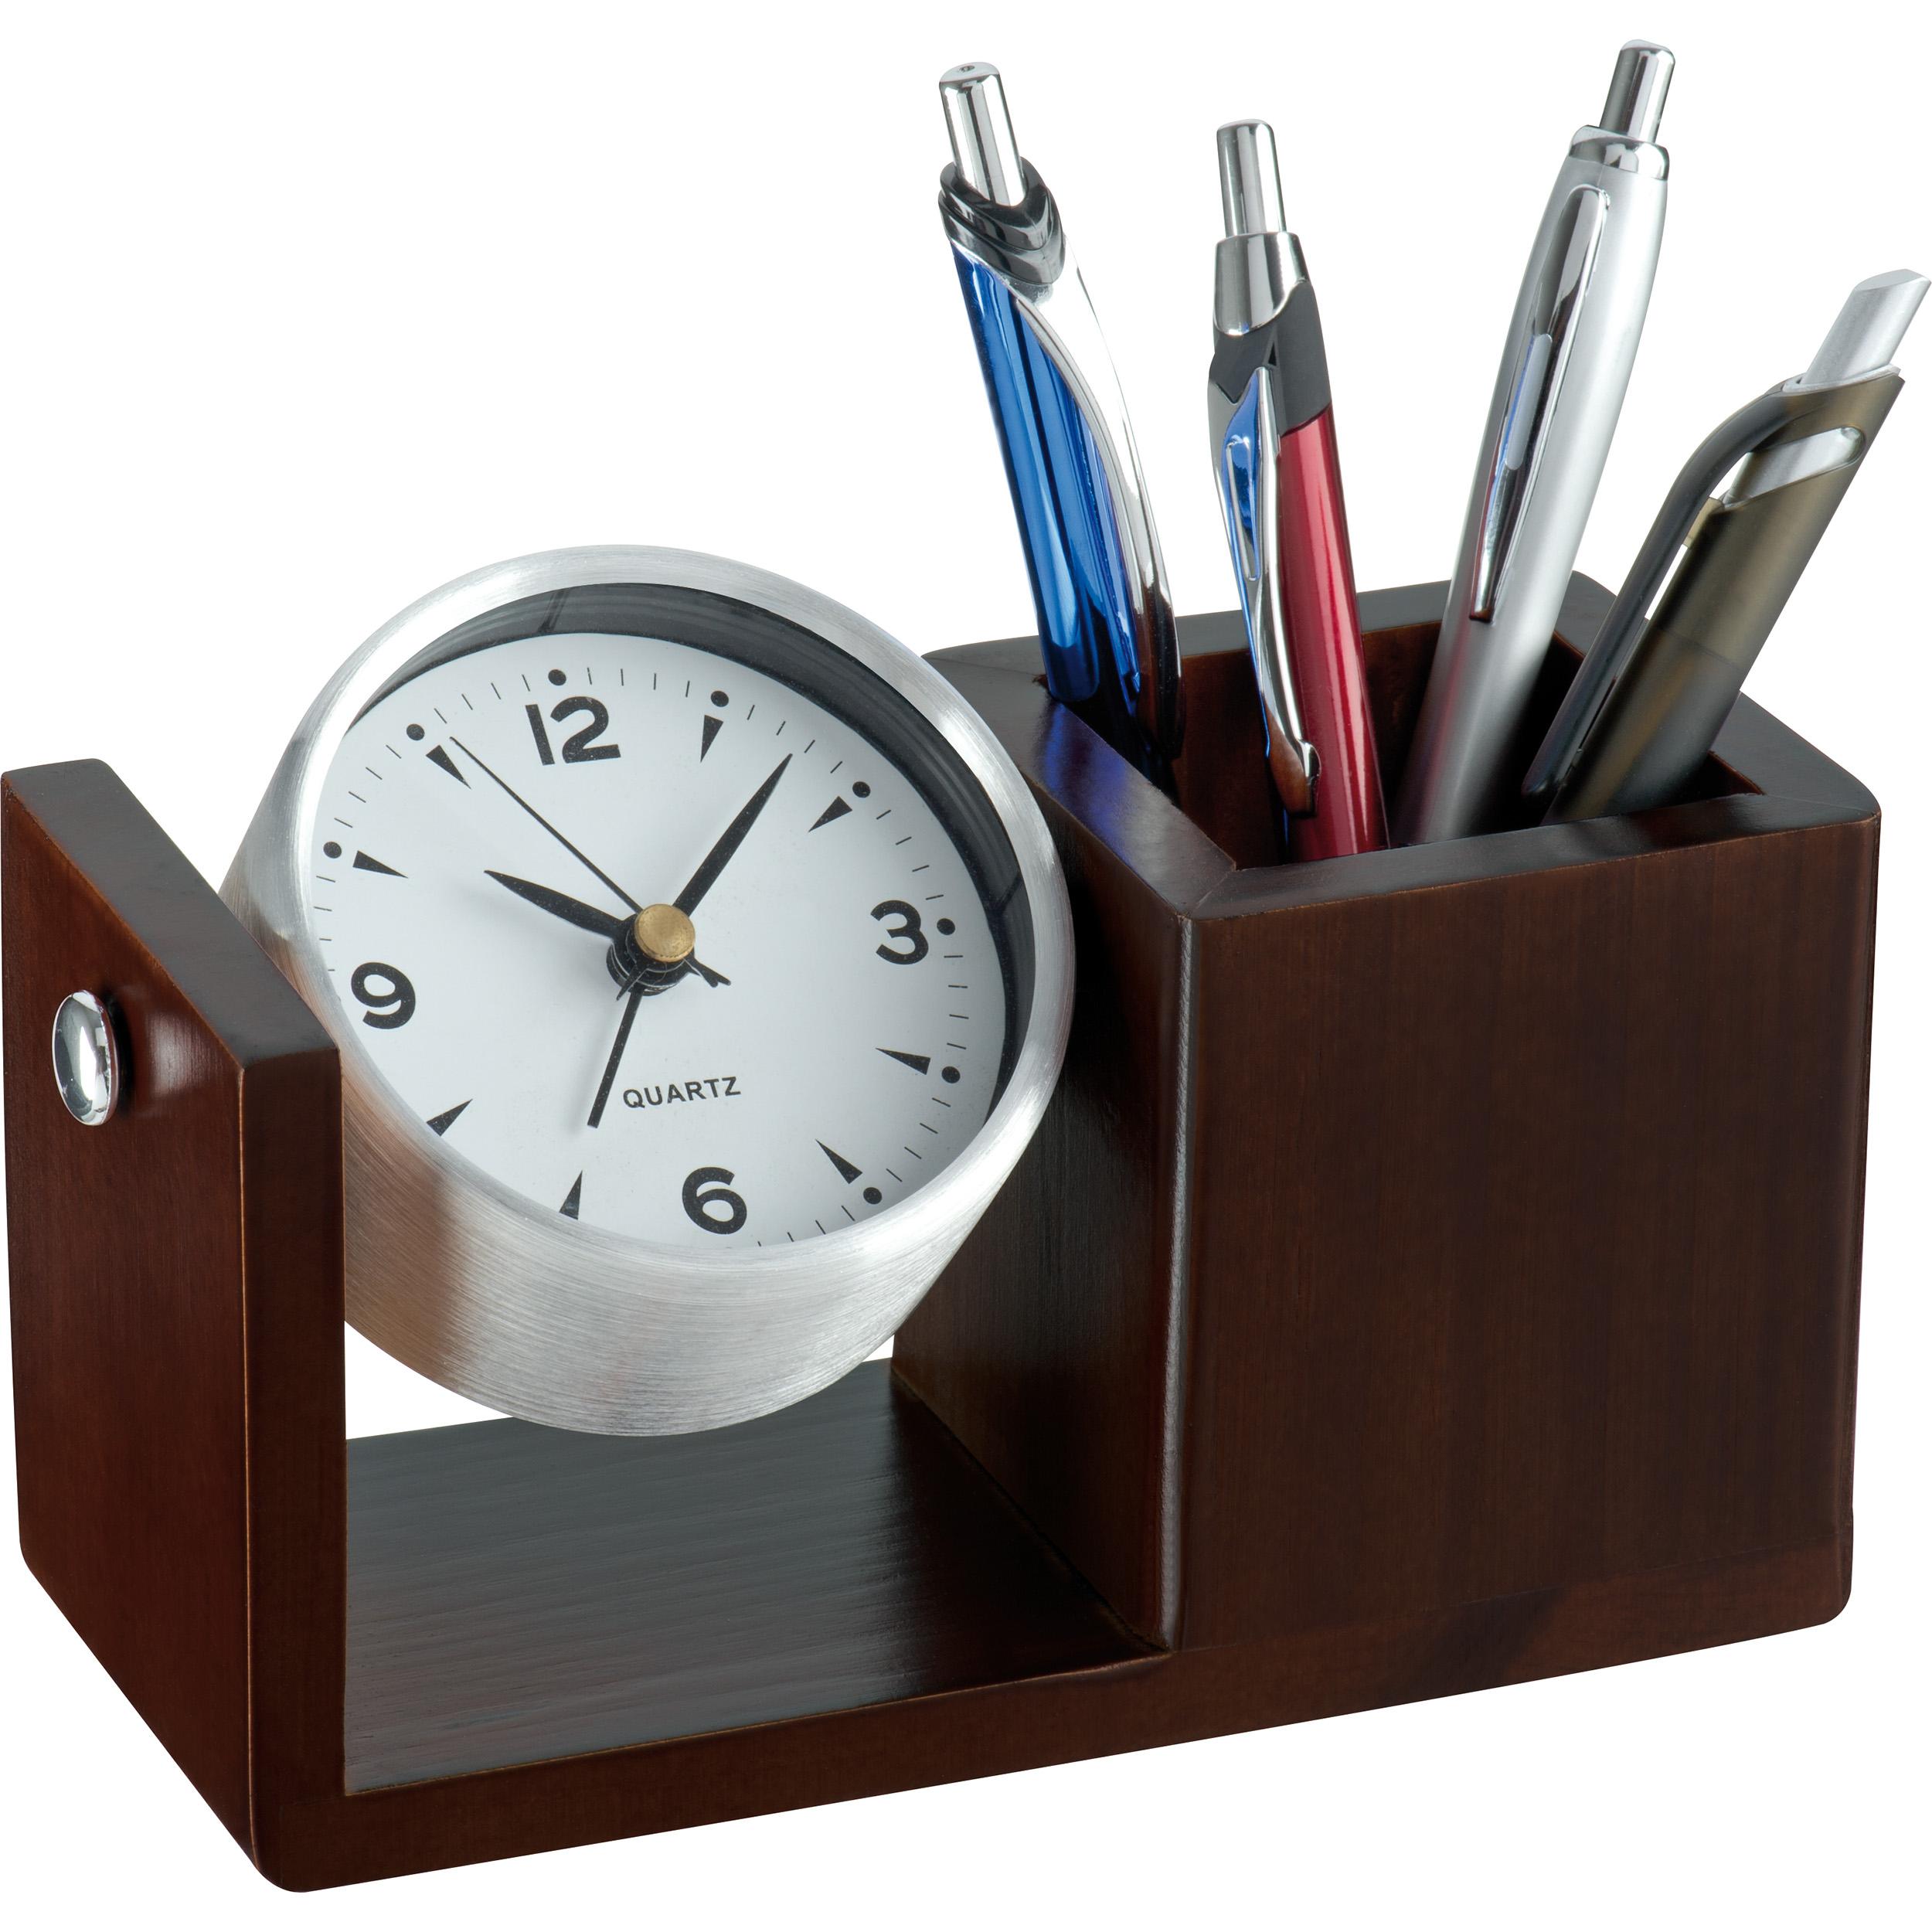 Luxurious desk clock